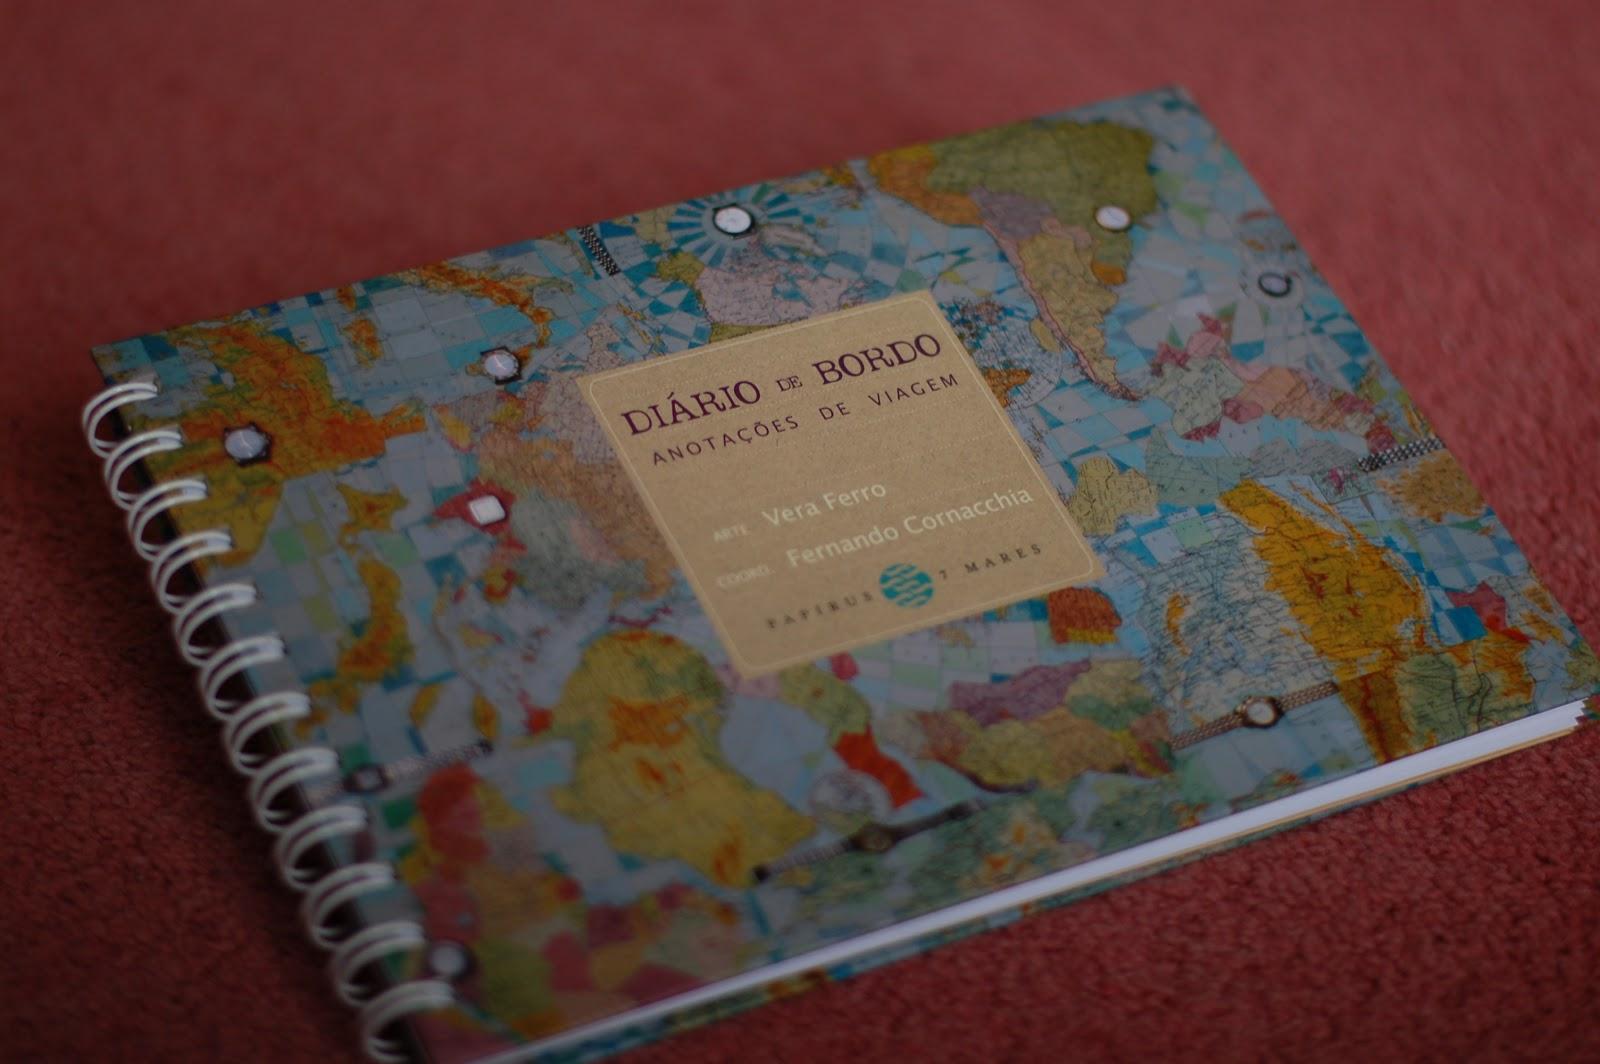 livro diario de bordo